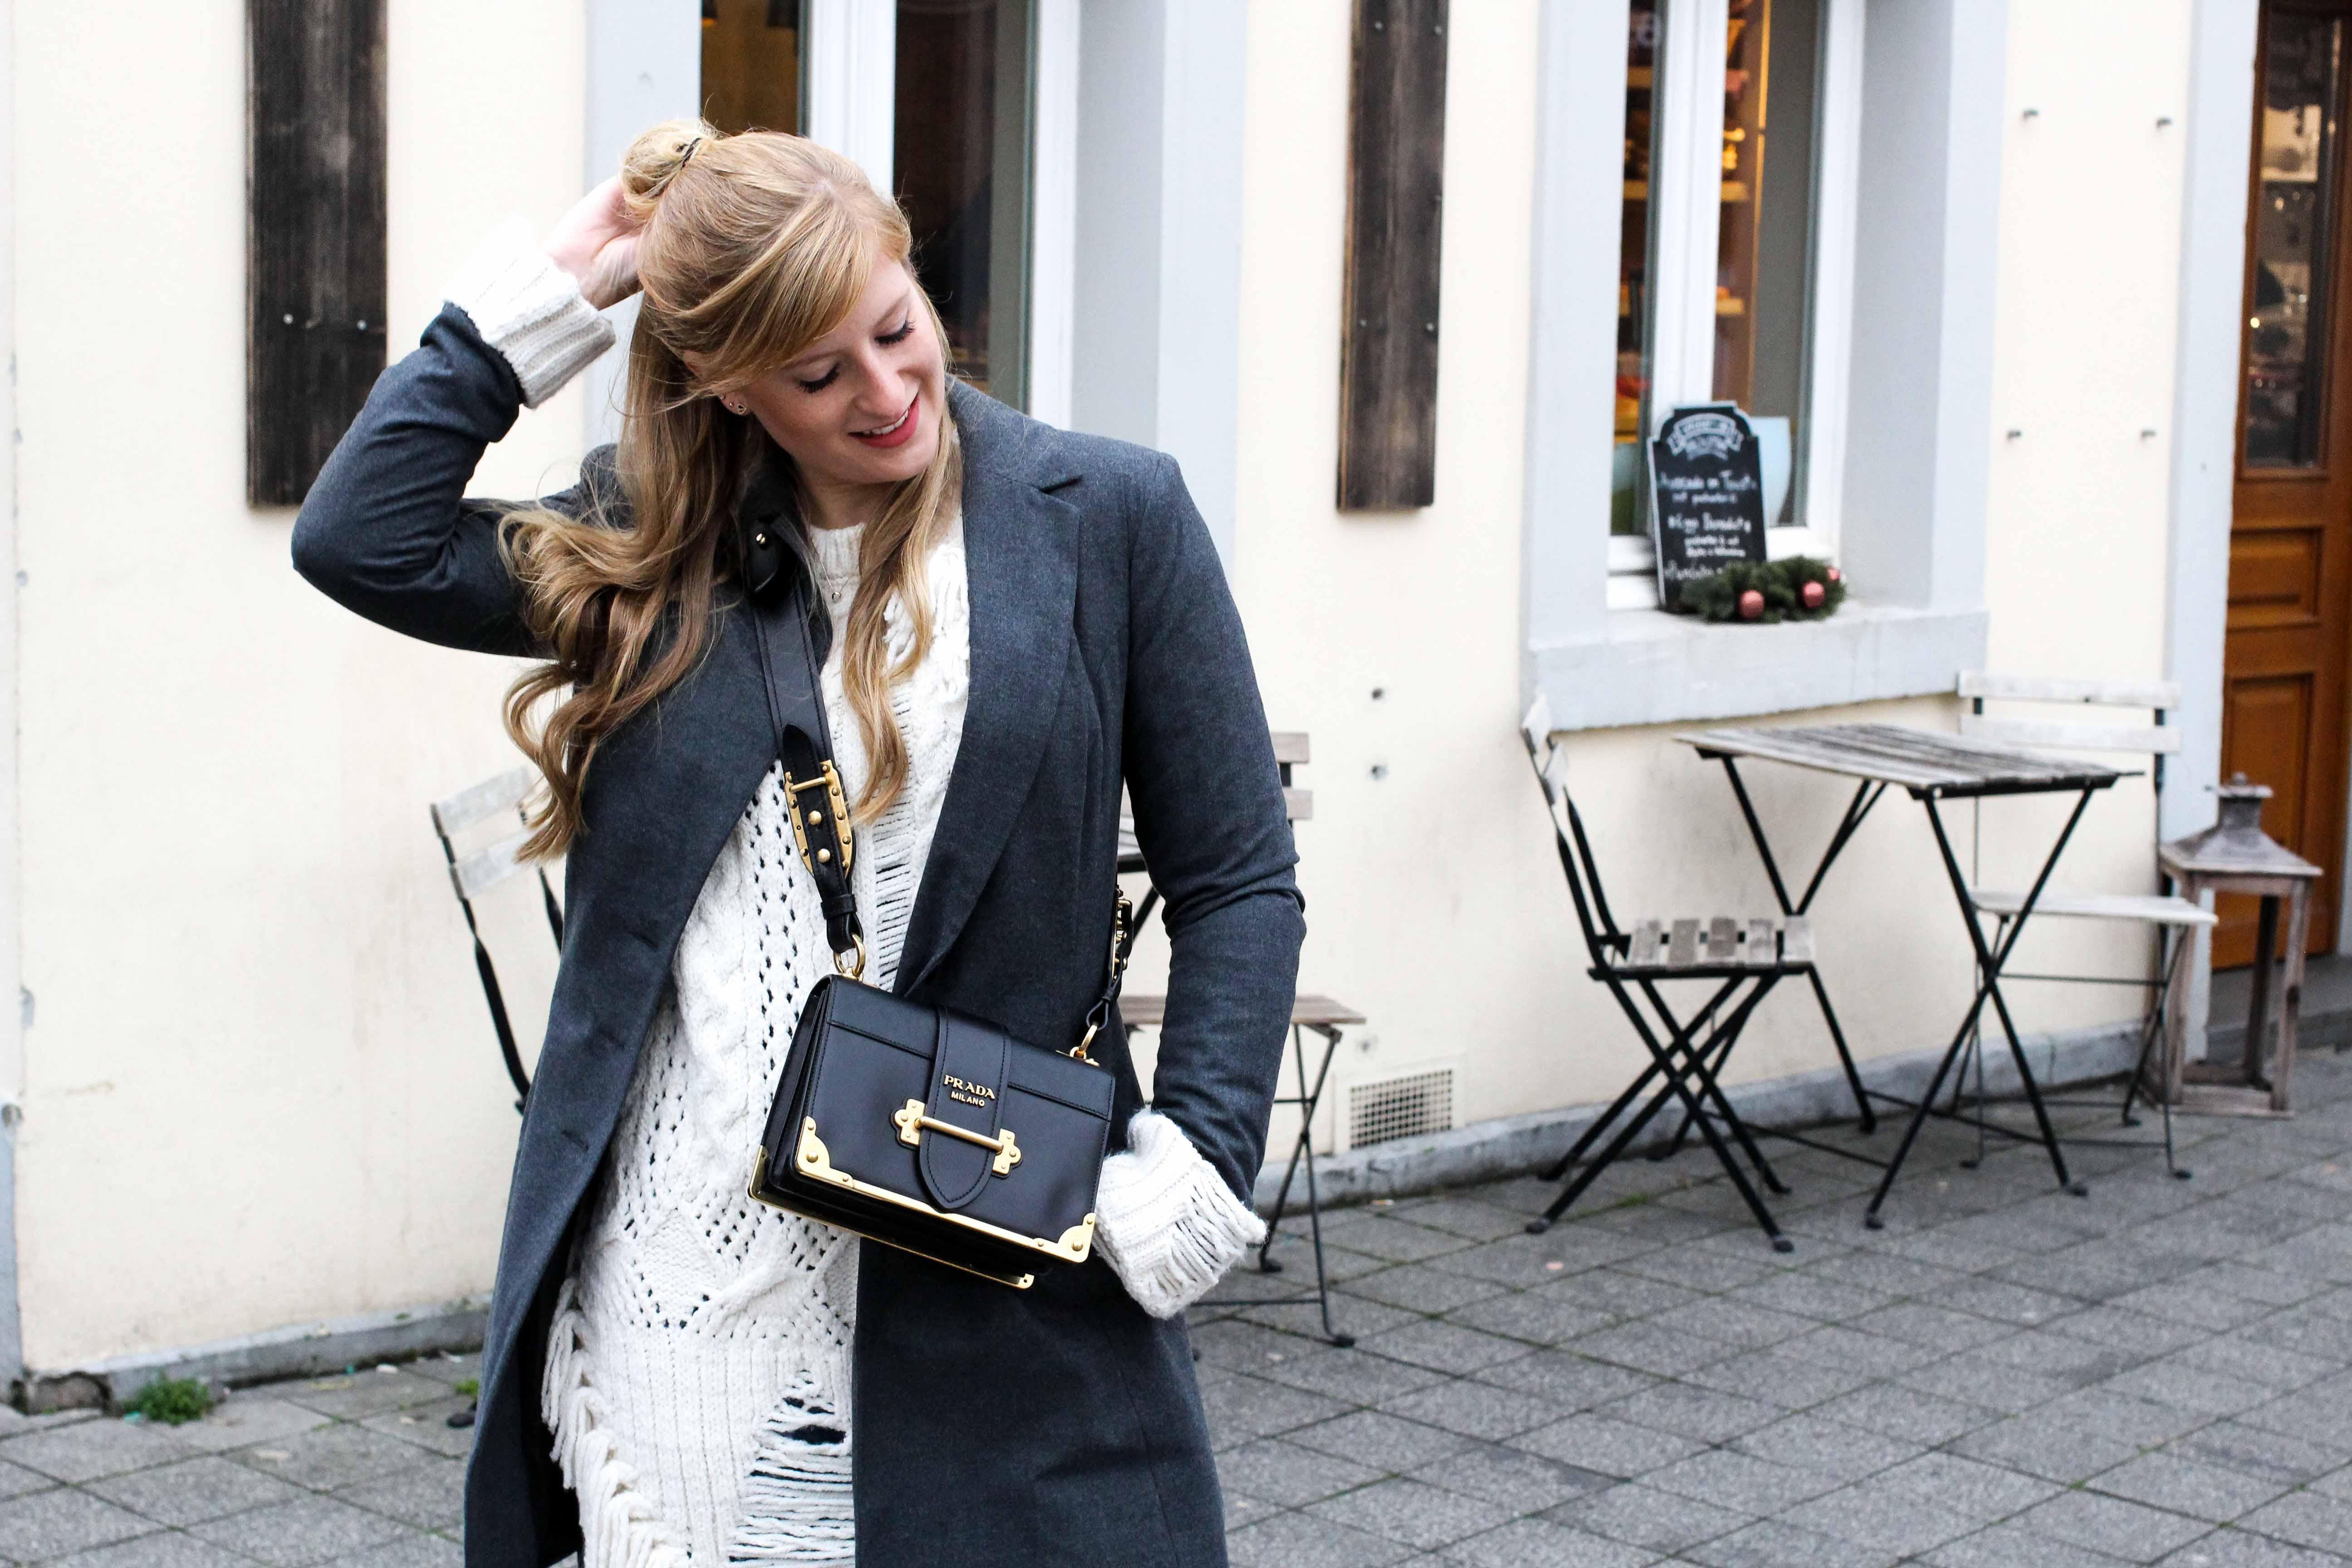 Outfit Zara Wollpullover kombinieren Winterlook Prada Cahier Tasche Classy Cozy Modeblog Bonn half bun 7